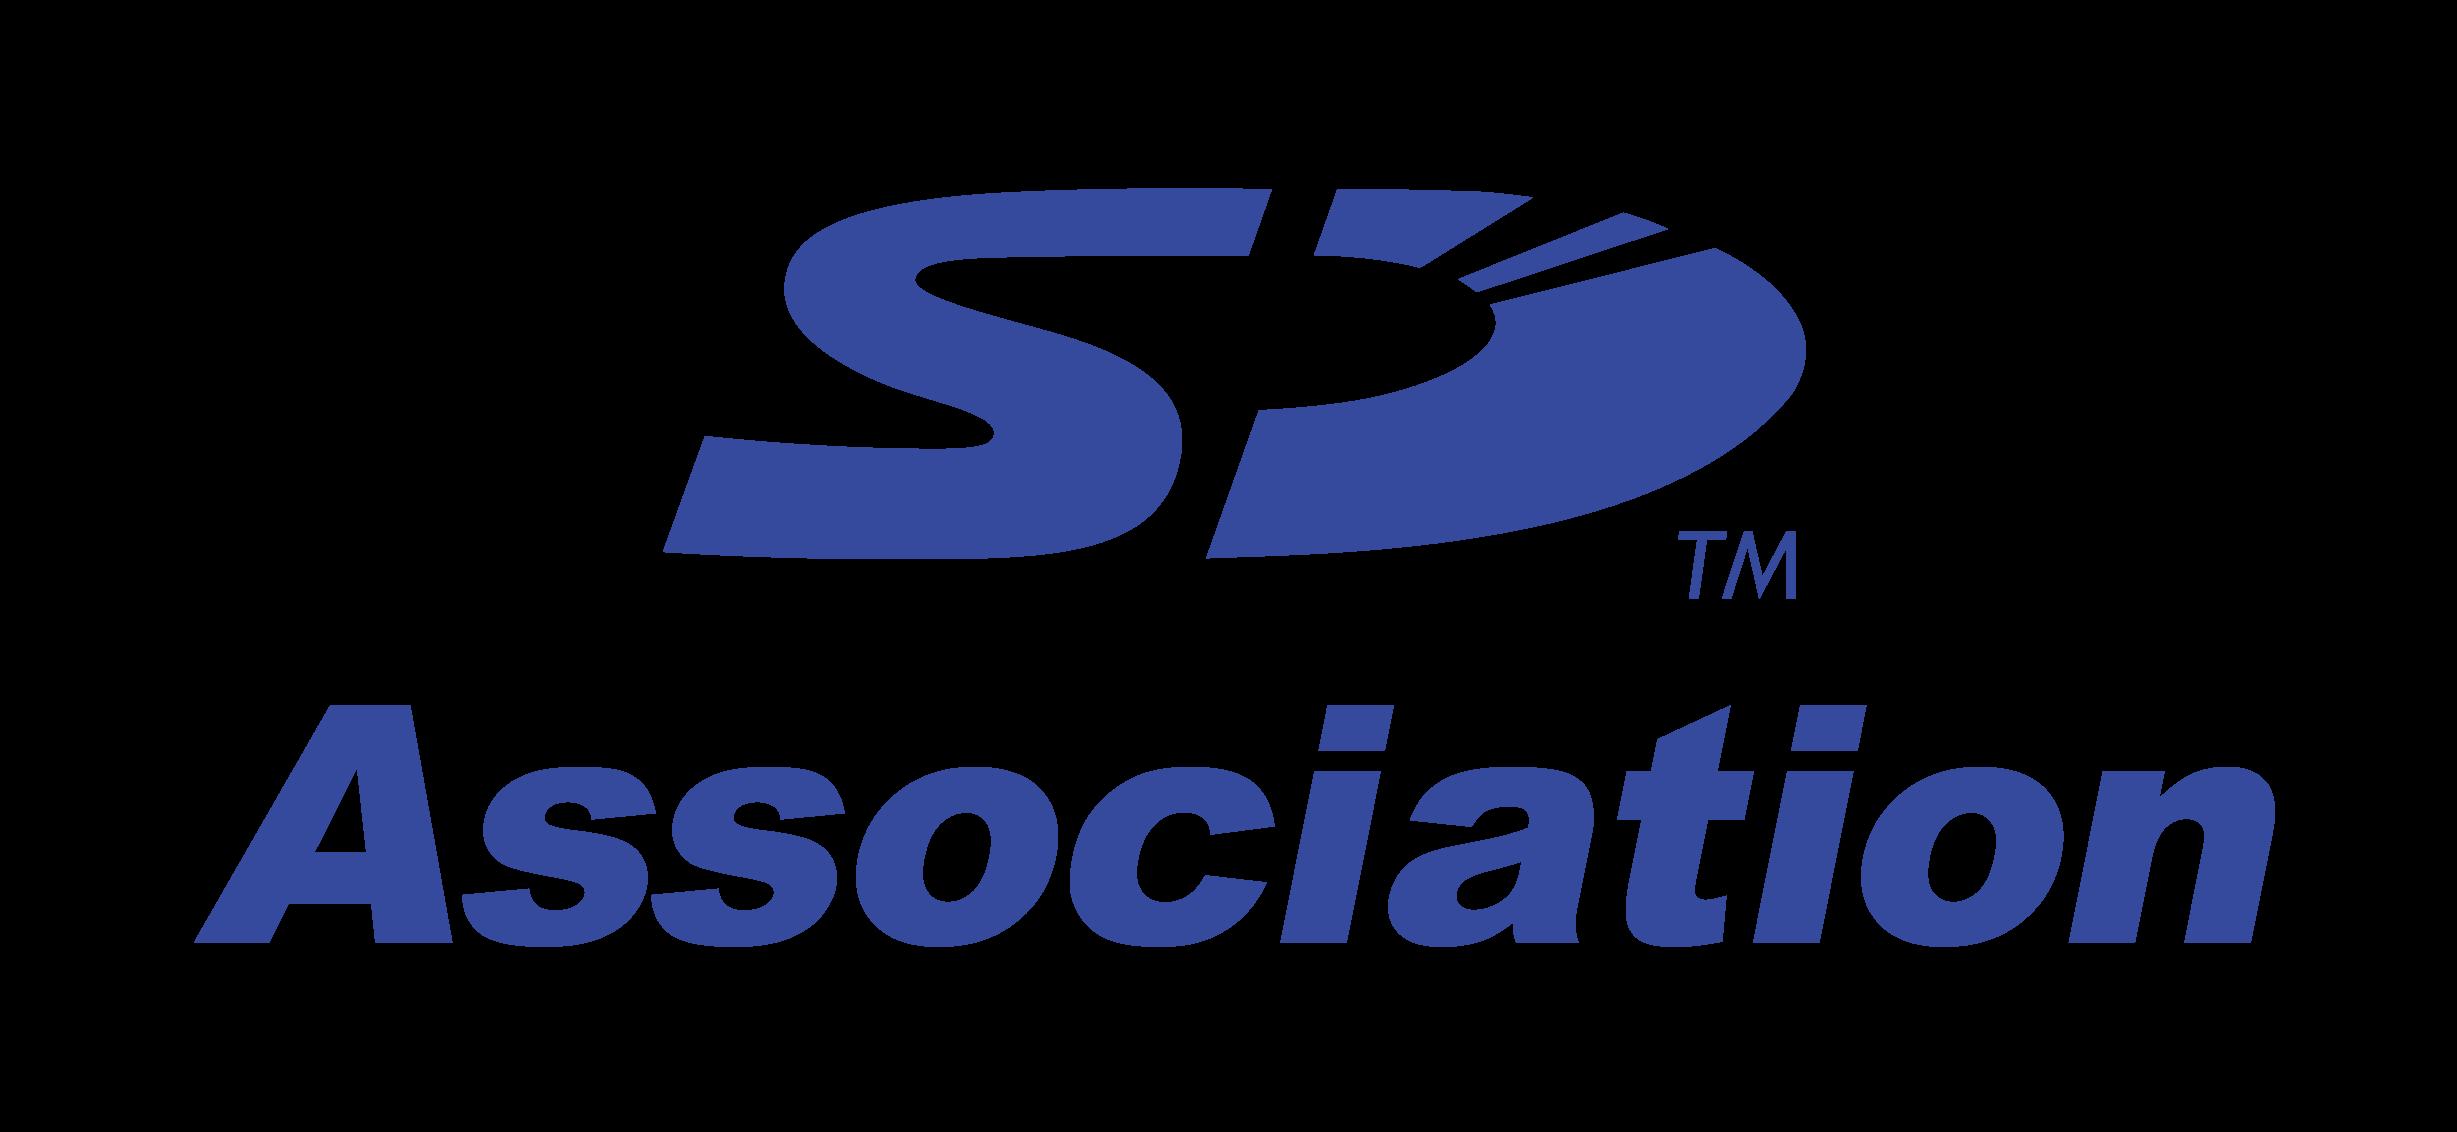 www.sdcard.org